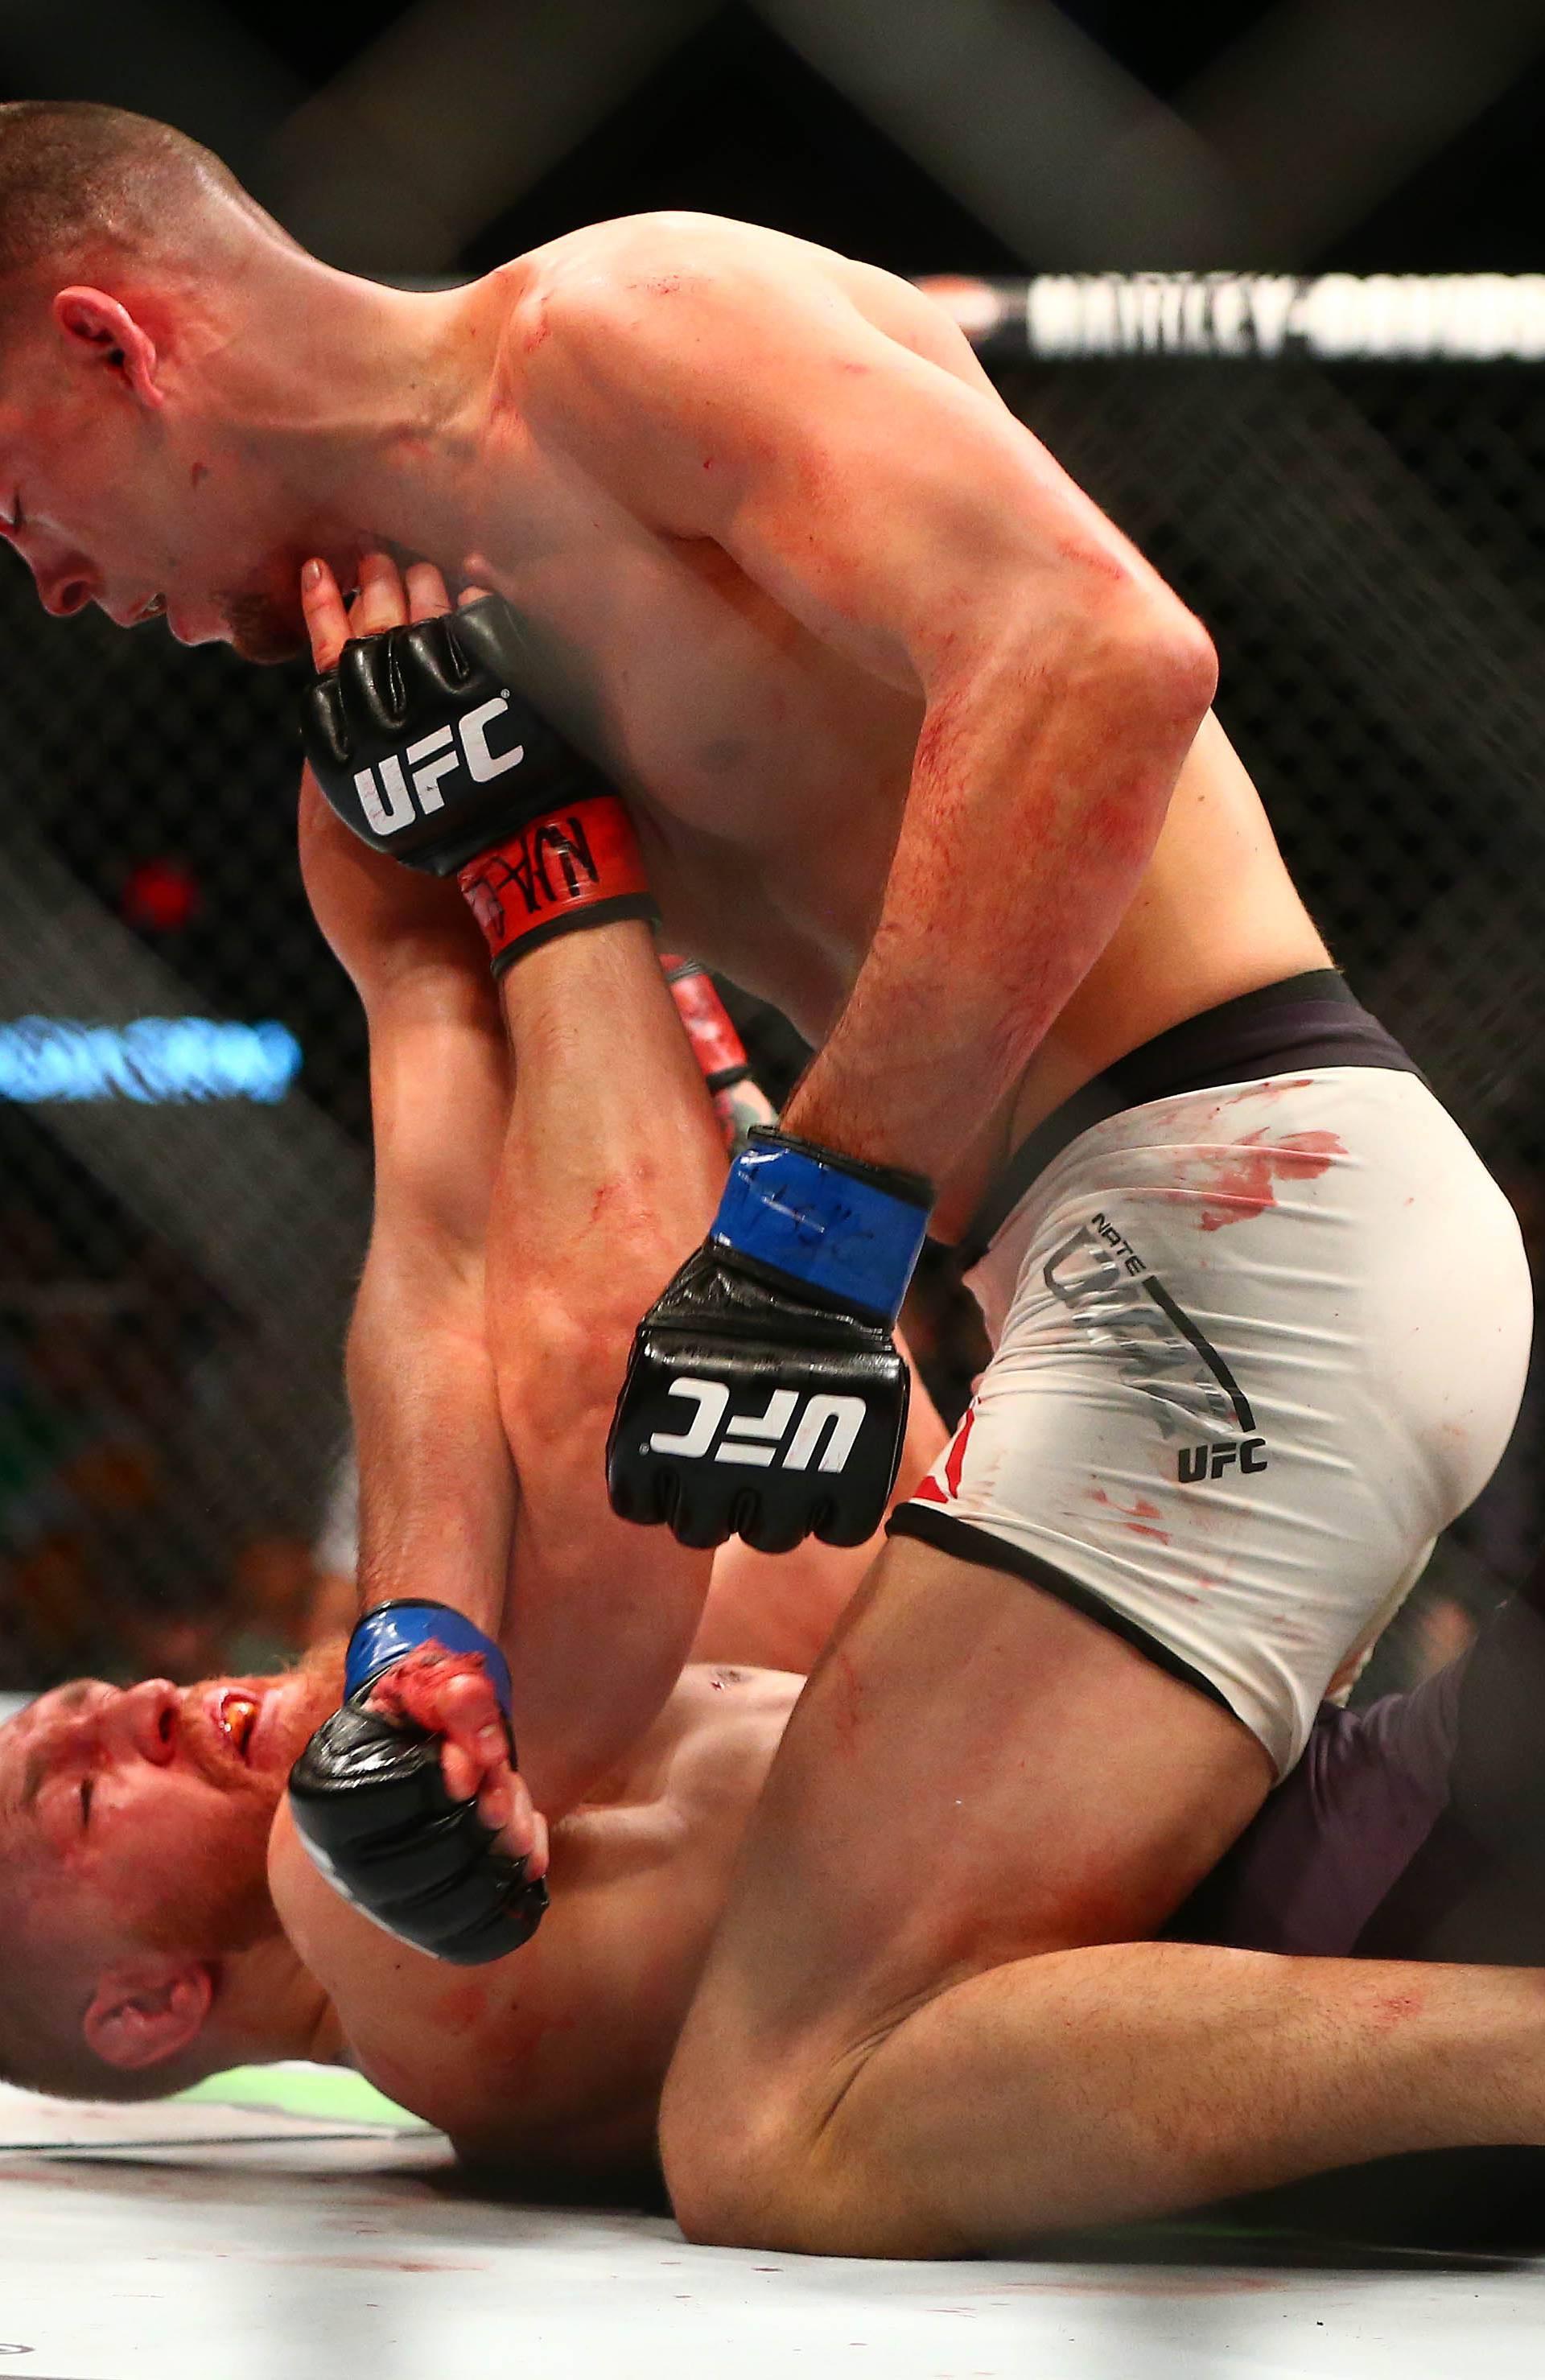 Nate Diaz: Ne želim skrivati da sam dopingiran, a UFC to hoće!